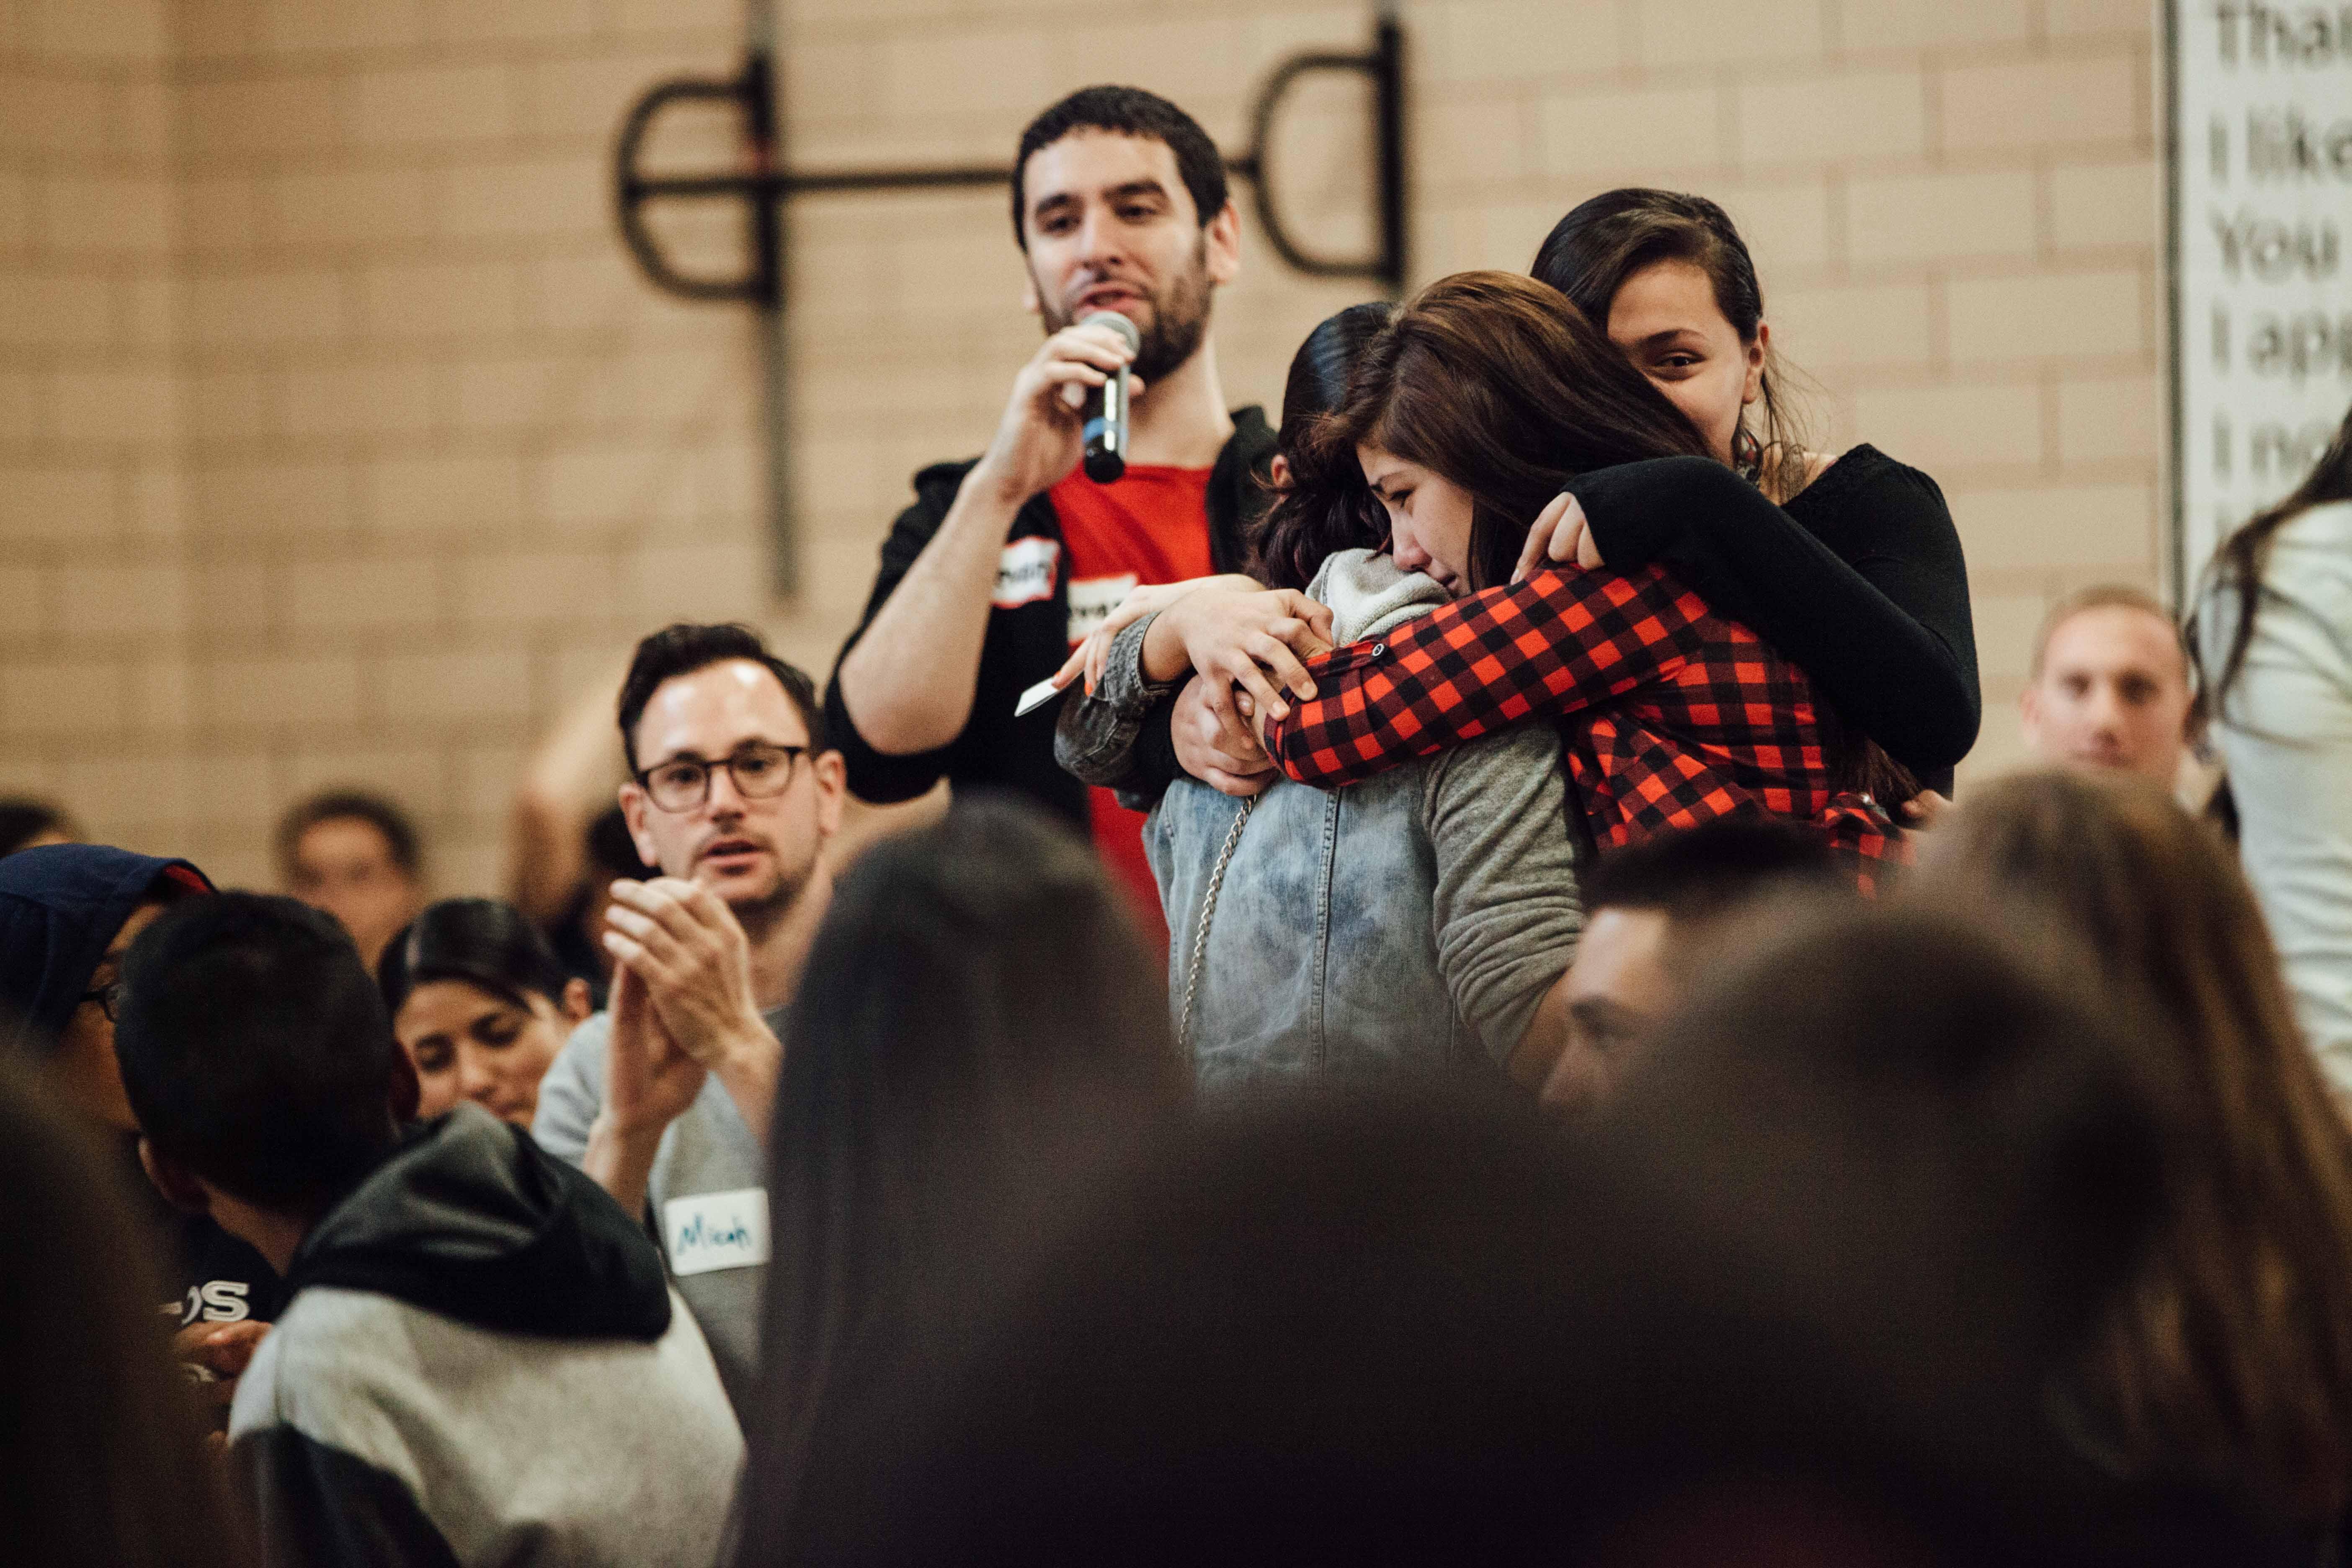 Photo: Bullying, Denver Challenge Day 12 embrace